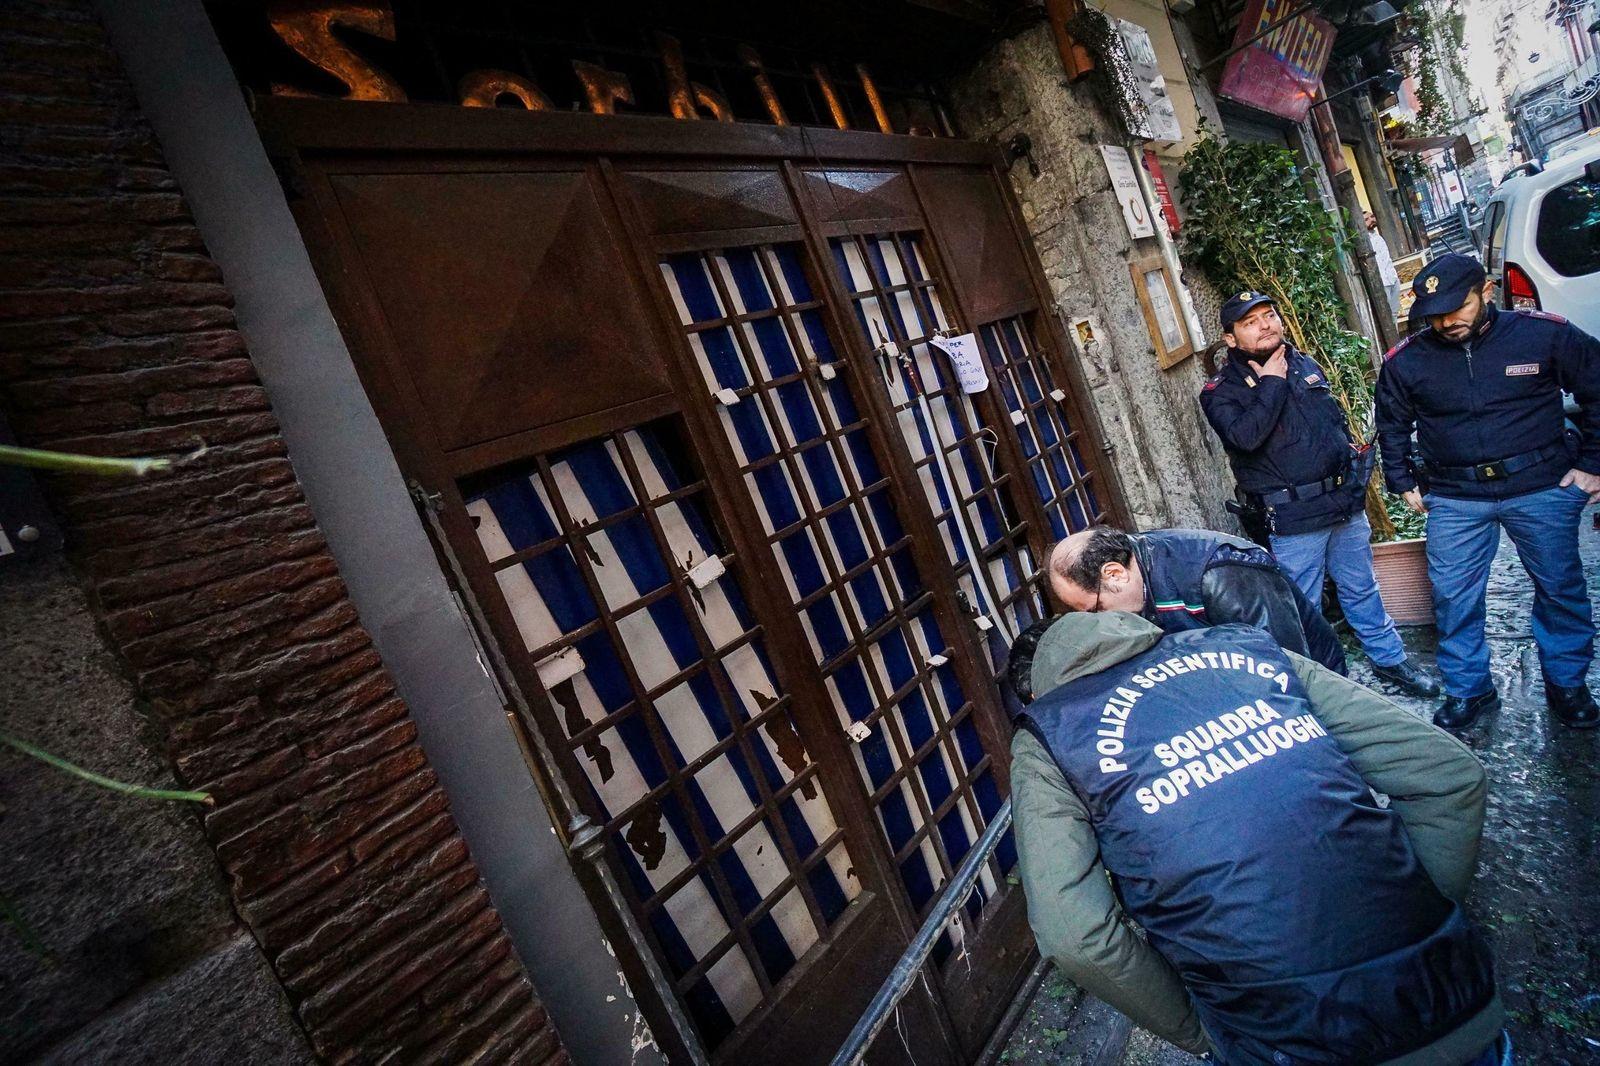 Bombenexplosion vor Pizzeria in Neapel